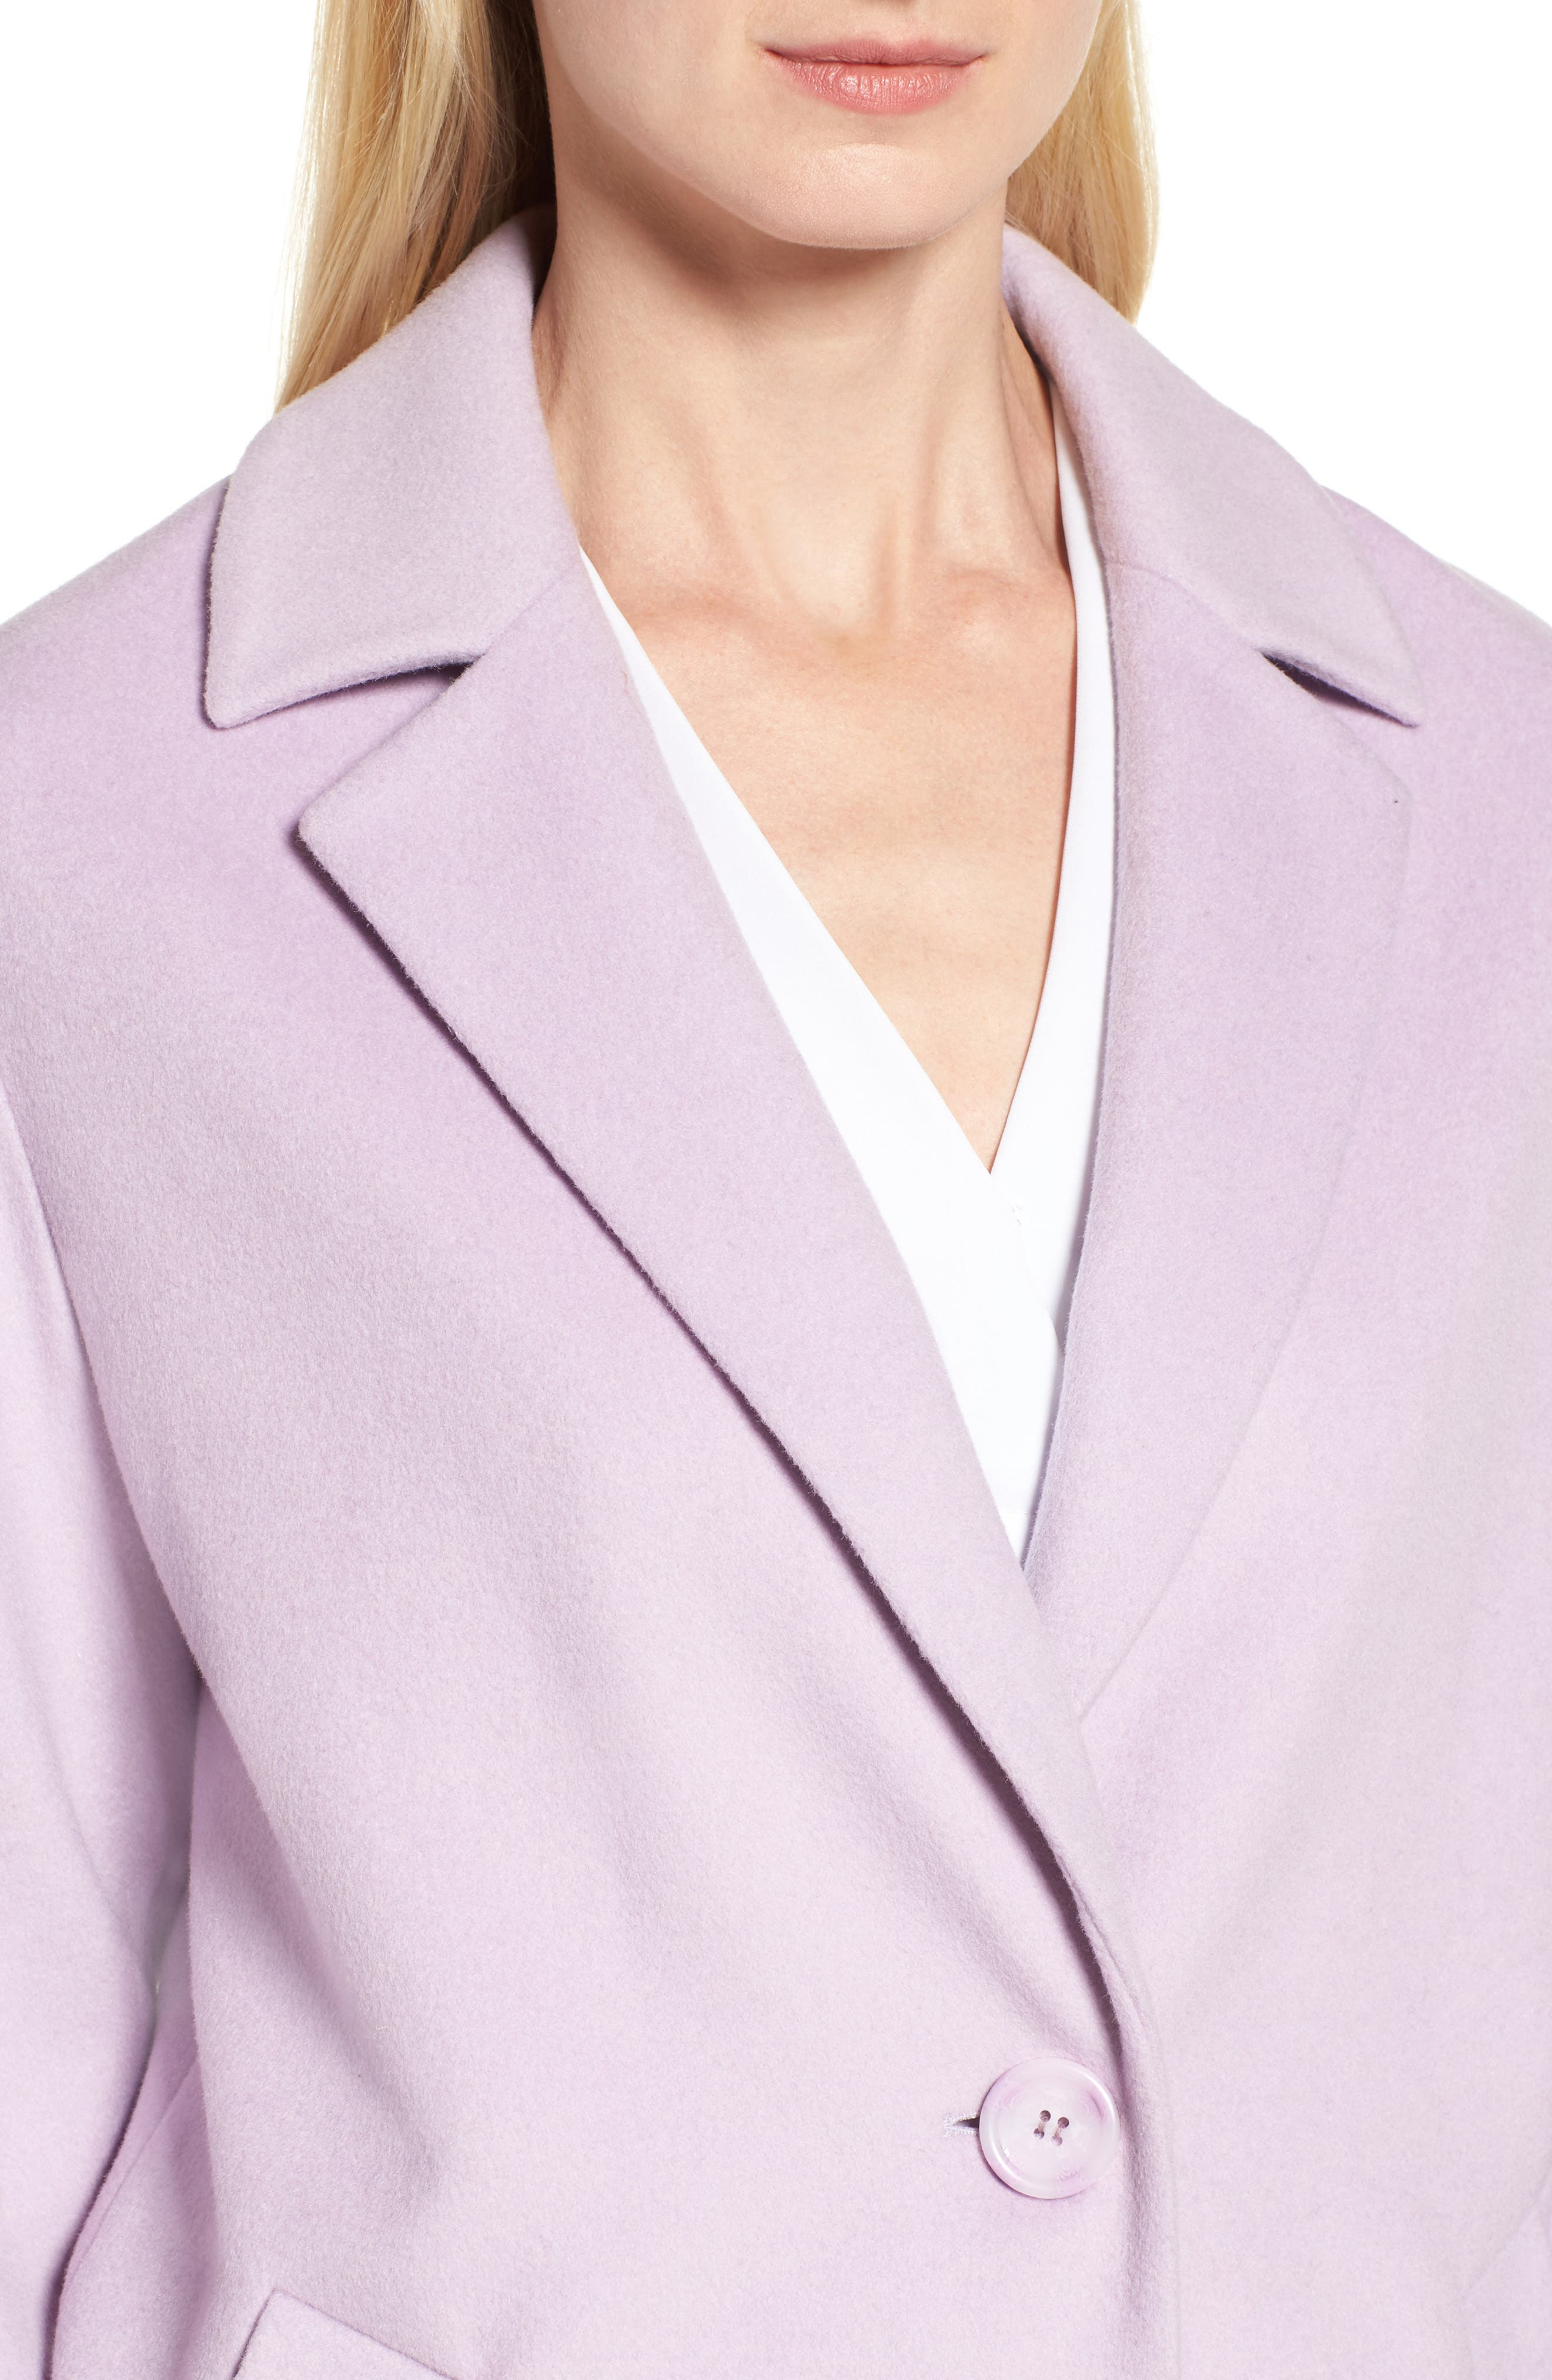 Wool Blend Coat,                             Alternate thumbnail 5, color,                             Icy Lavendar